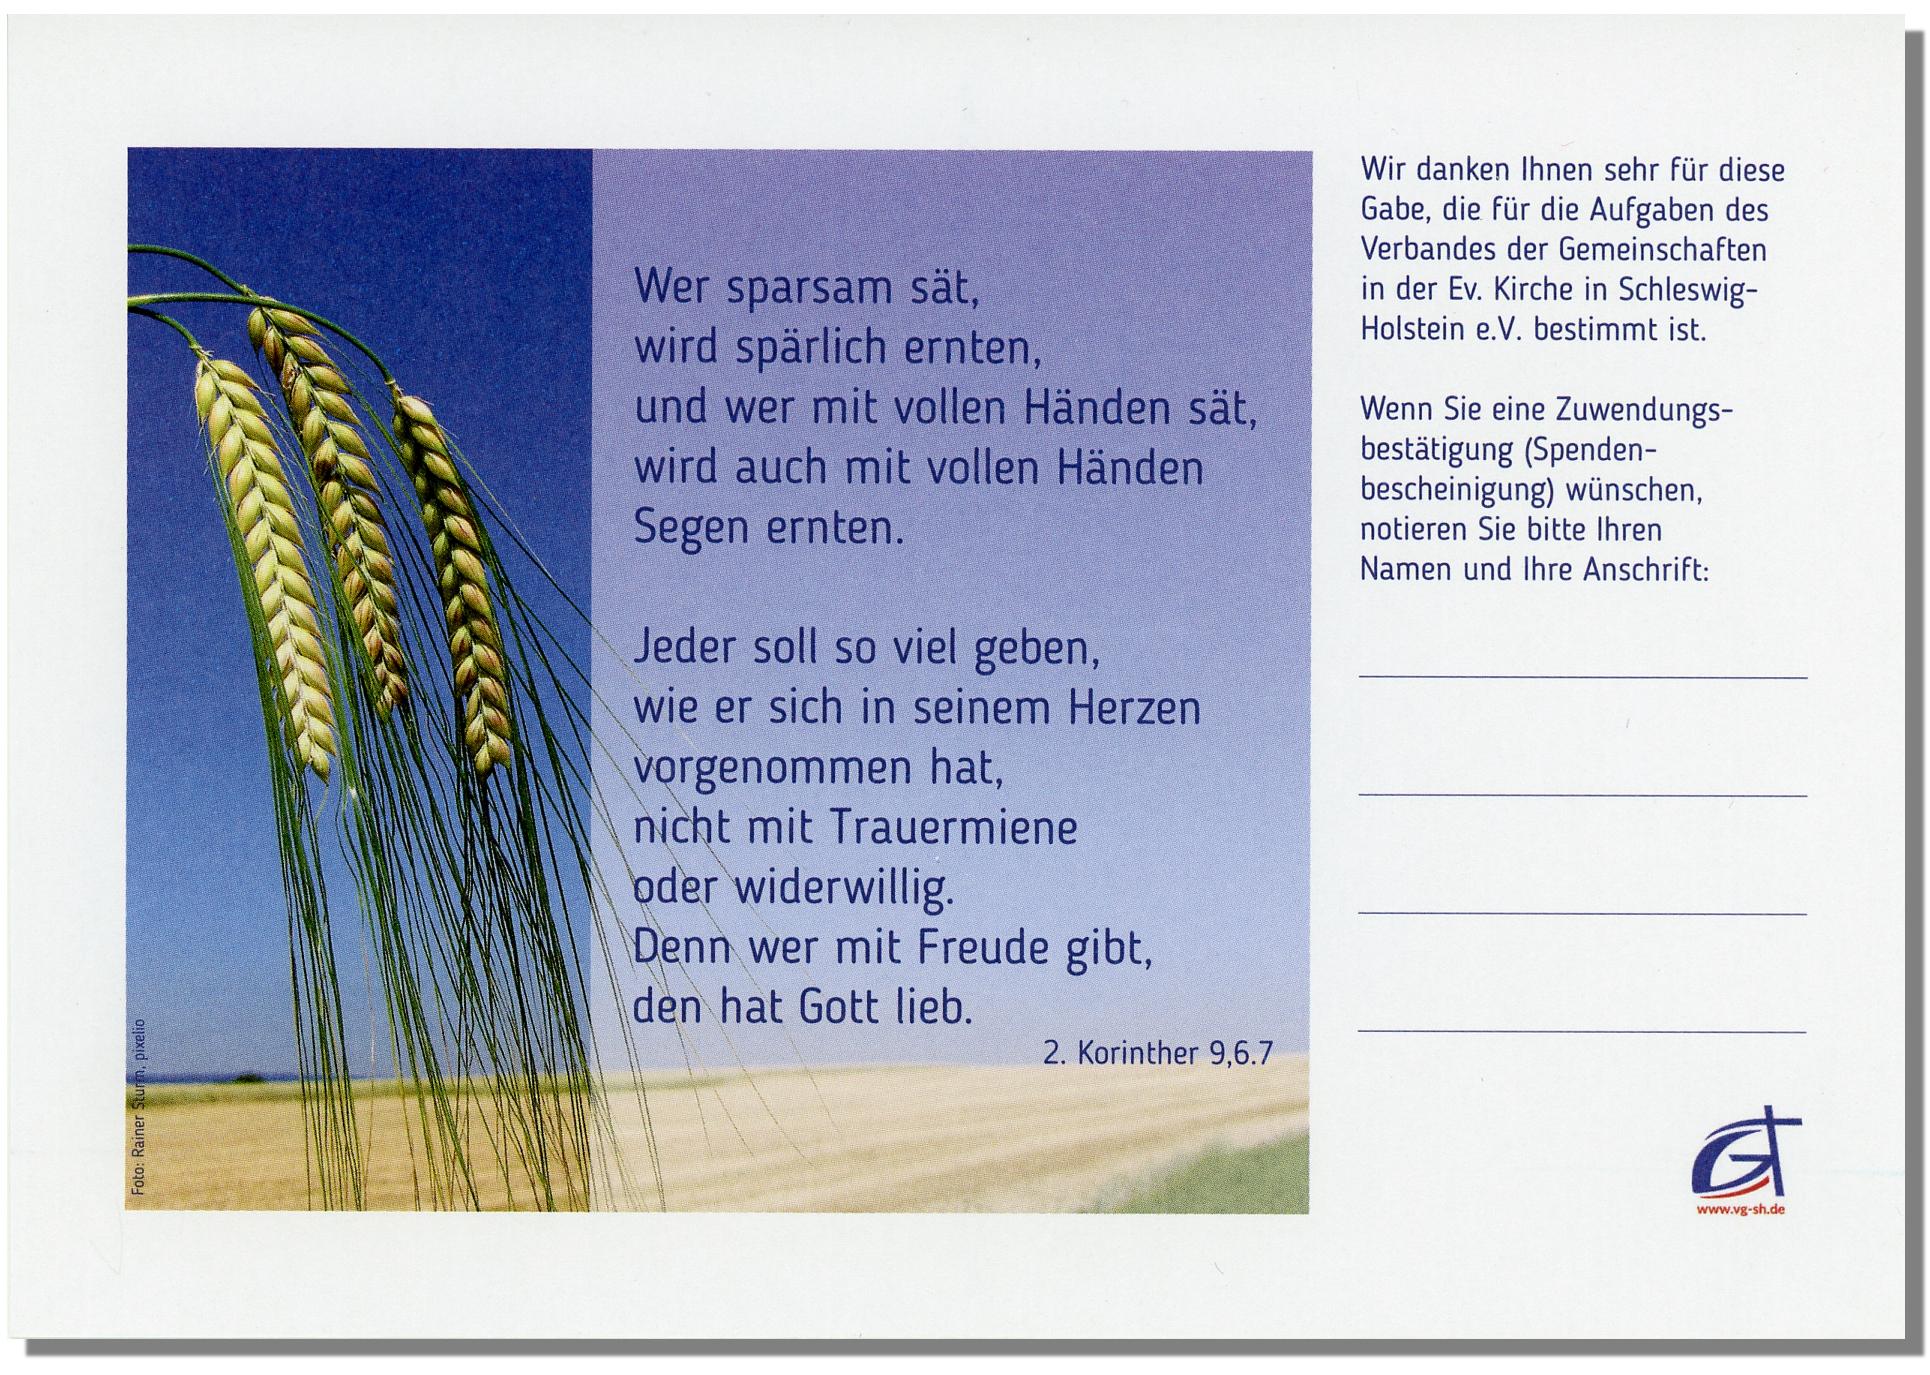 Rainer Sturm, pixelio